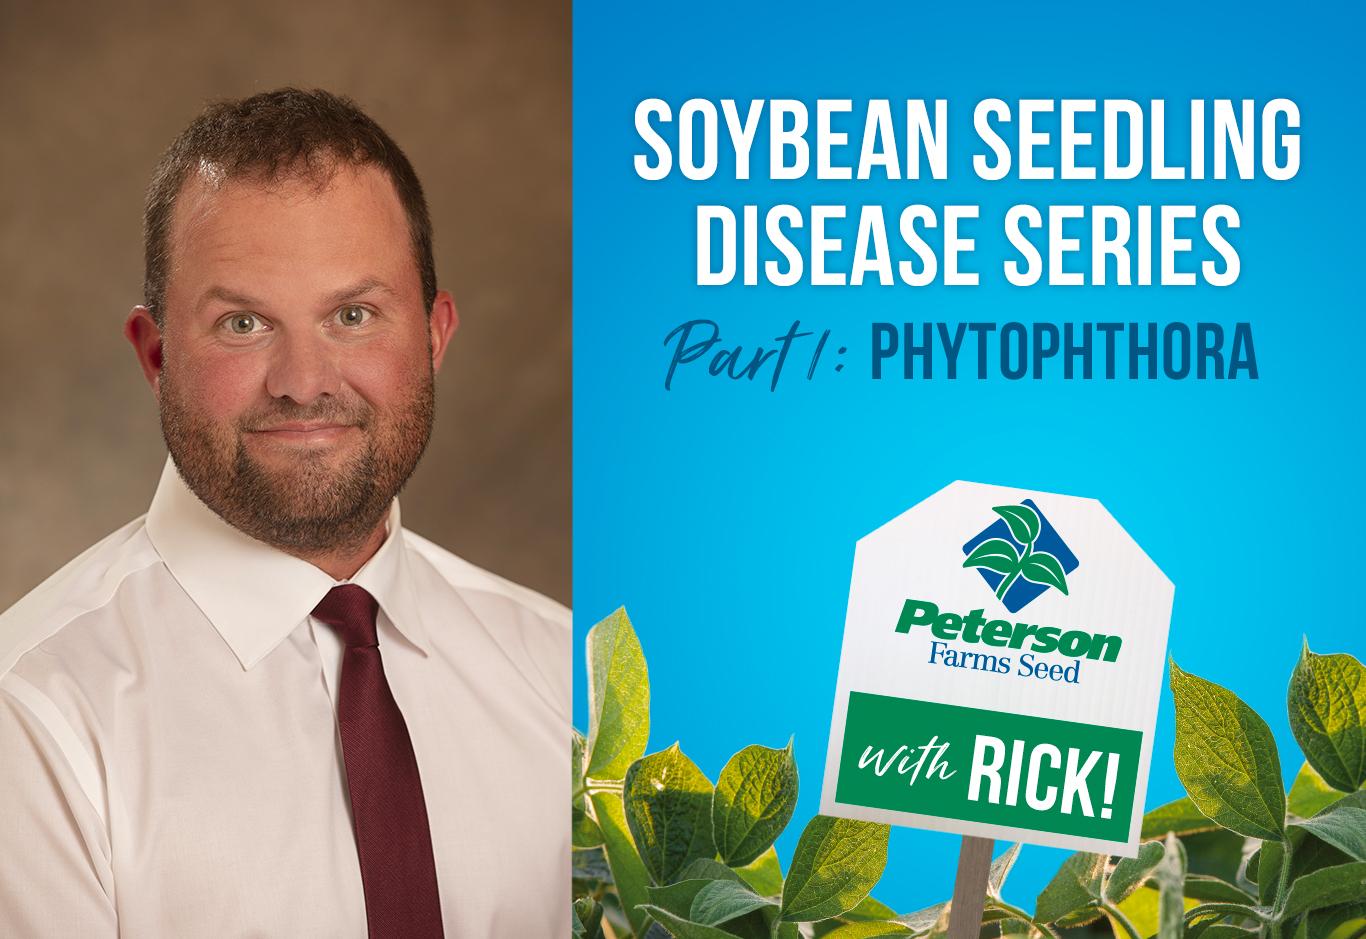 Phytophthora Soybean Seedling Disease